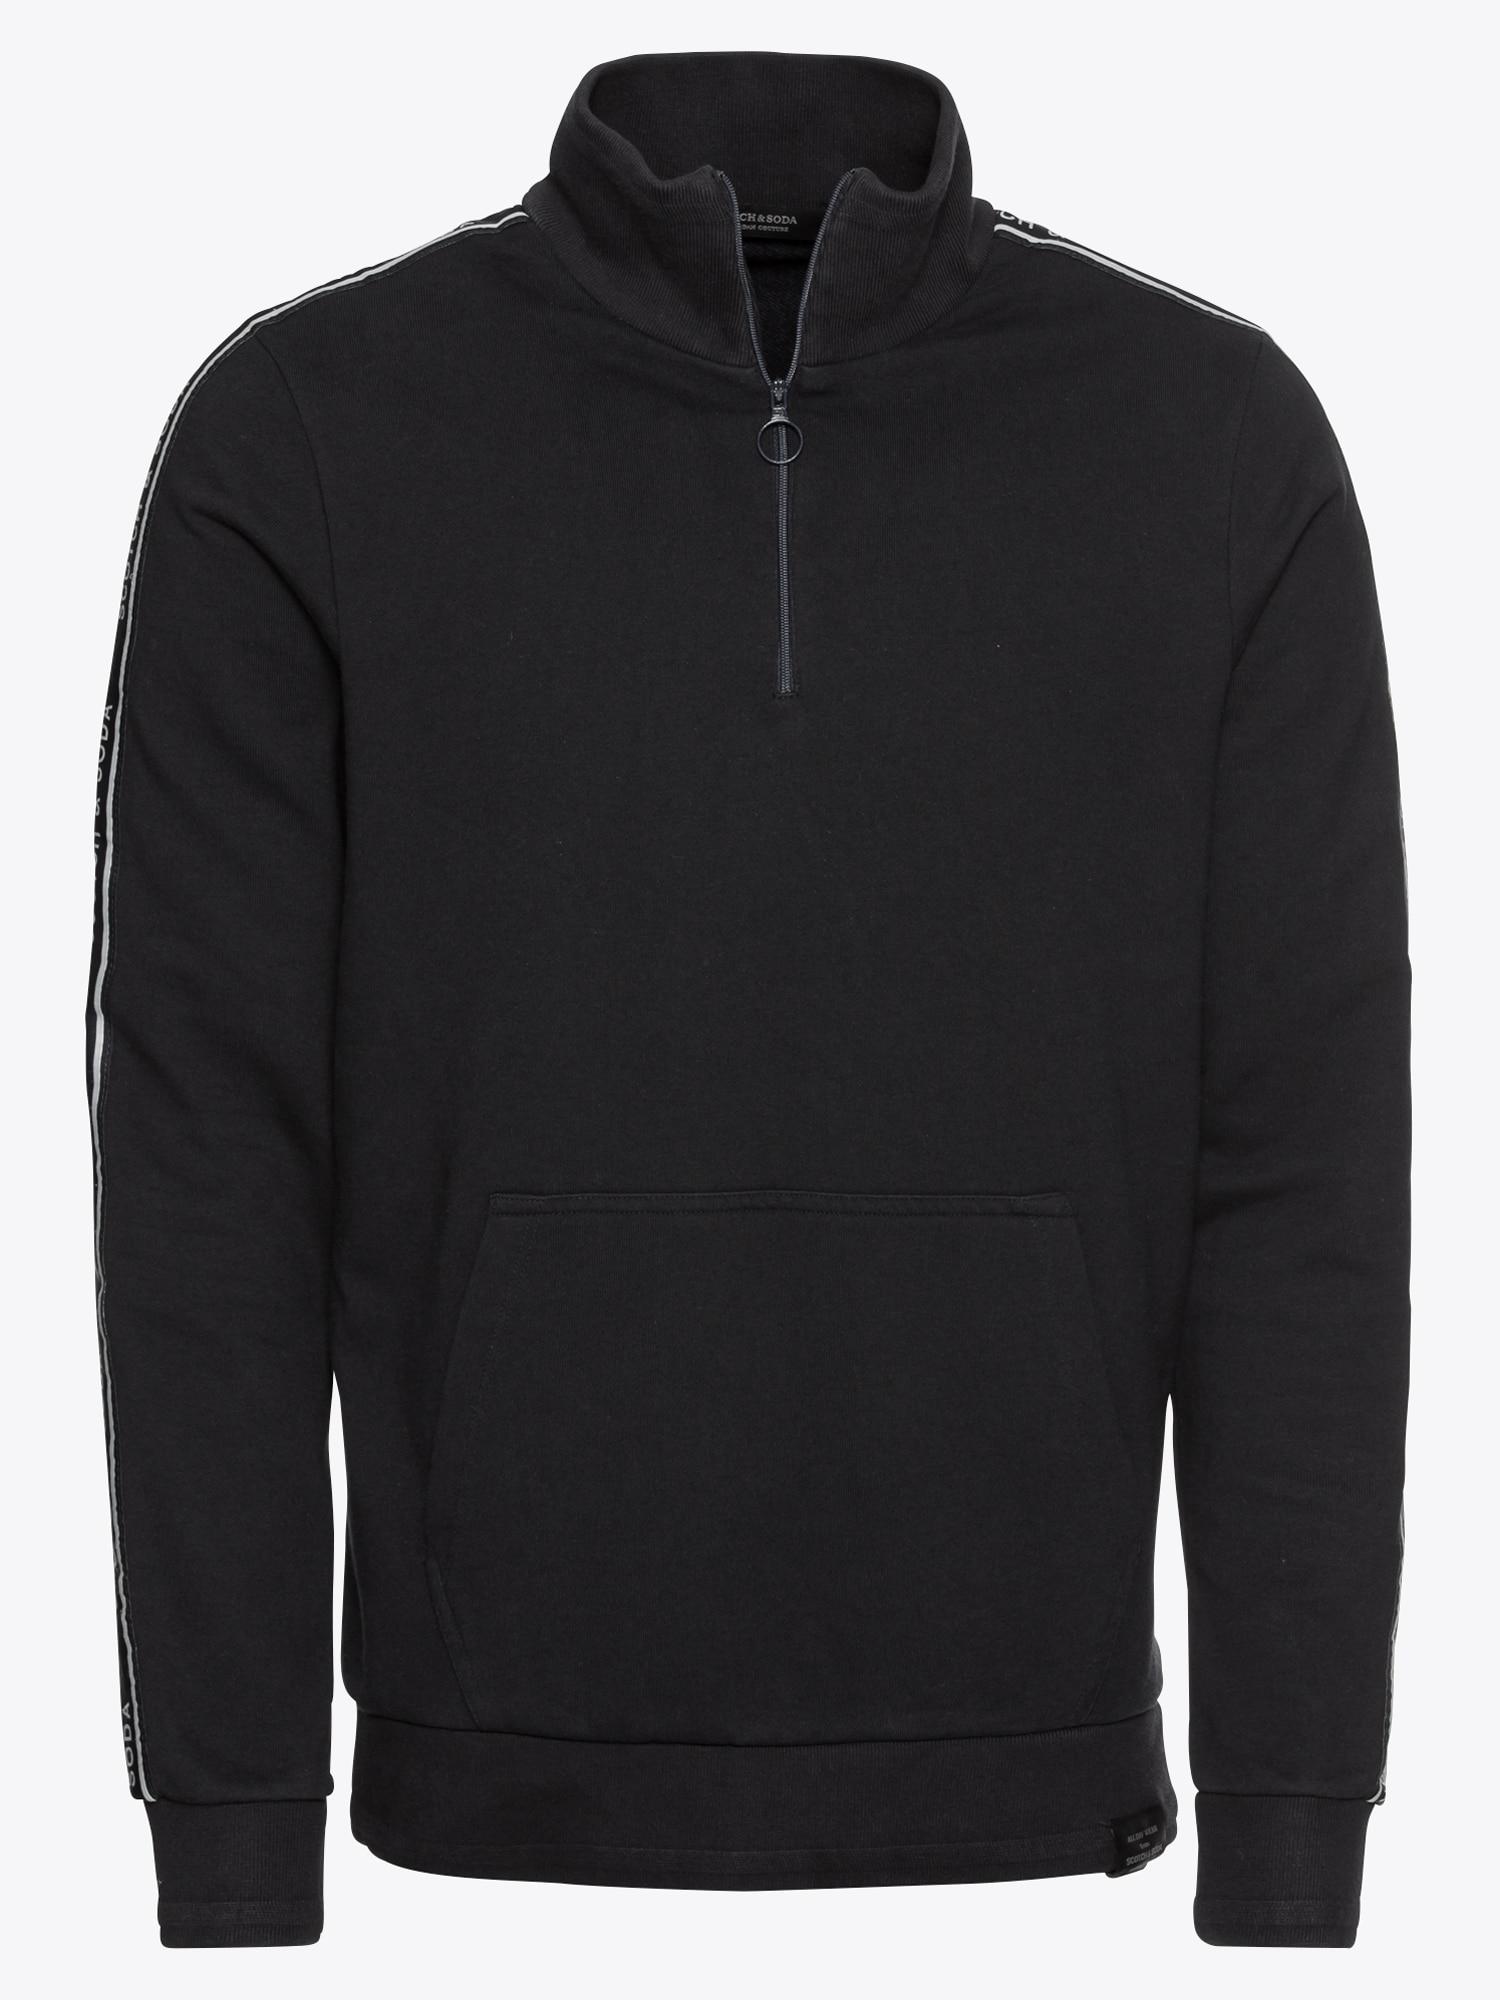 Sweatshirt 'Half-zip track top in felpa quality with branded tapes'